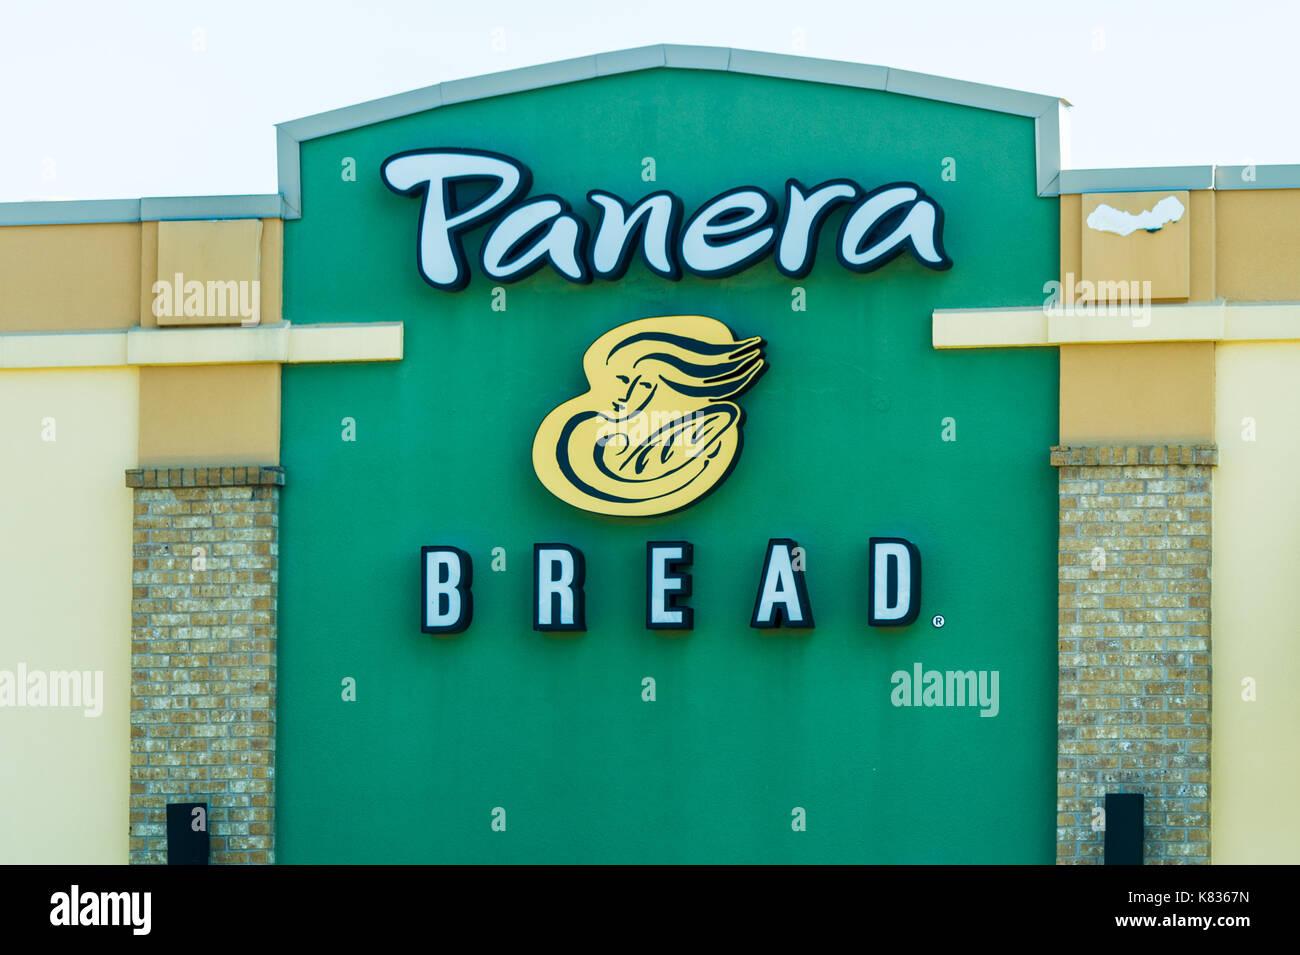 panera bread stock photos u0026 panera bread stock images alamy